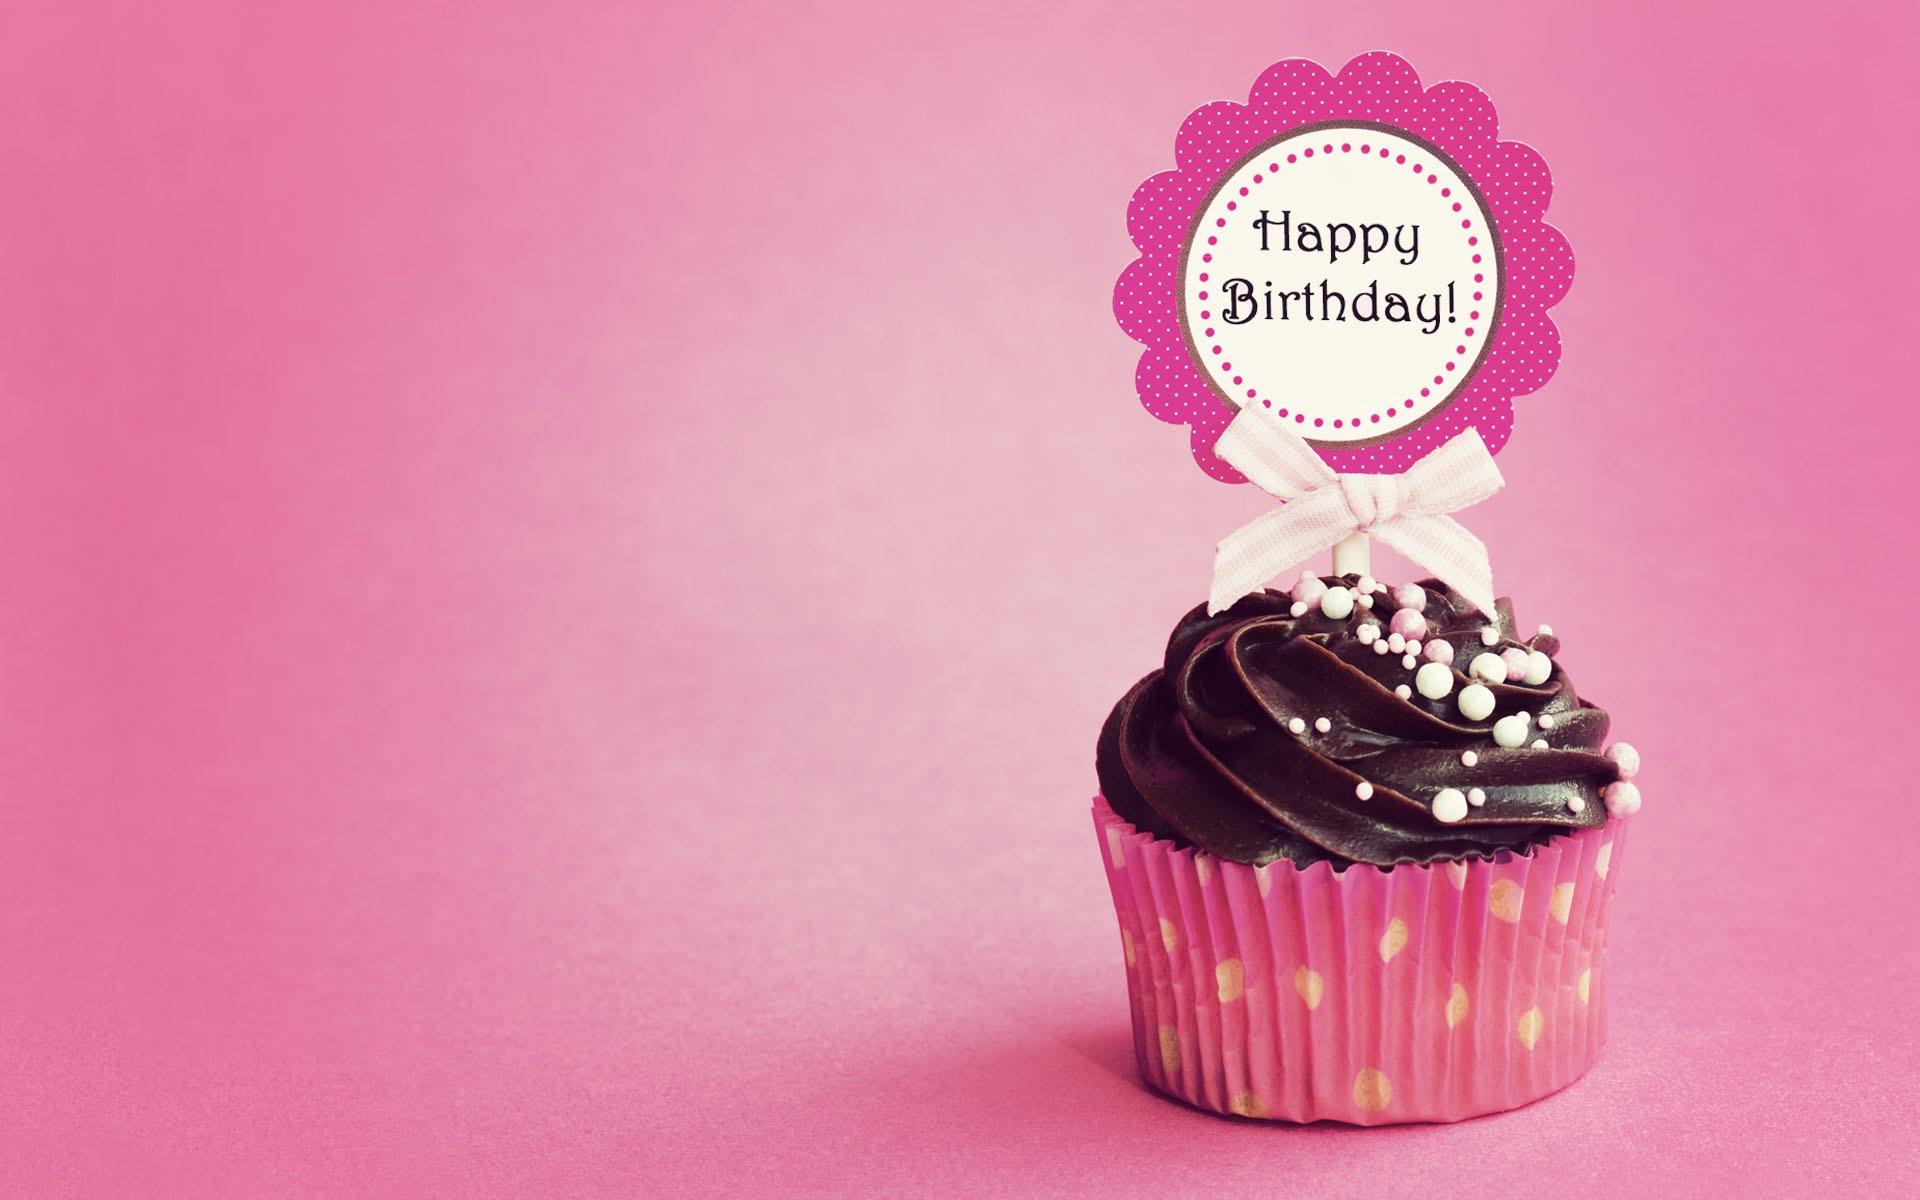 Happy birthday wonderful cake HD Wallpapers Rocks 1920x1200